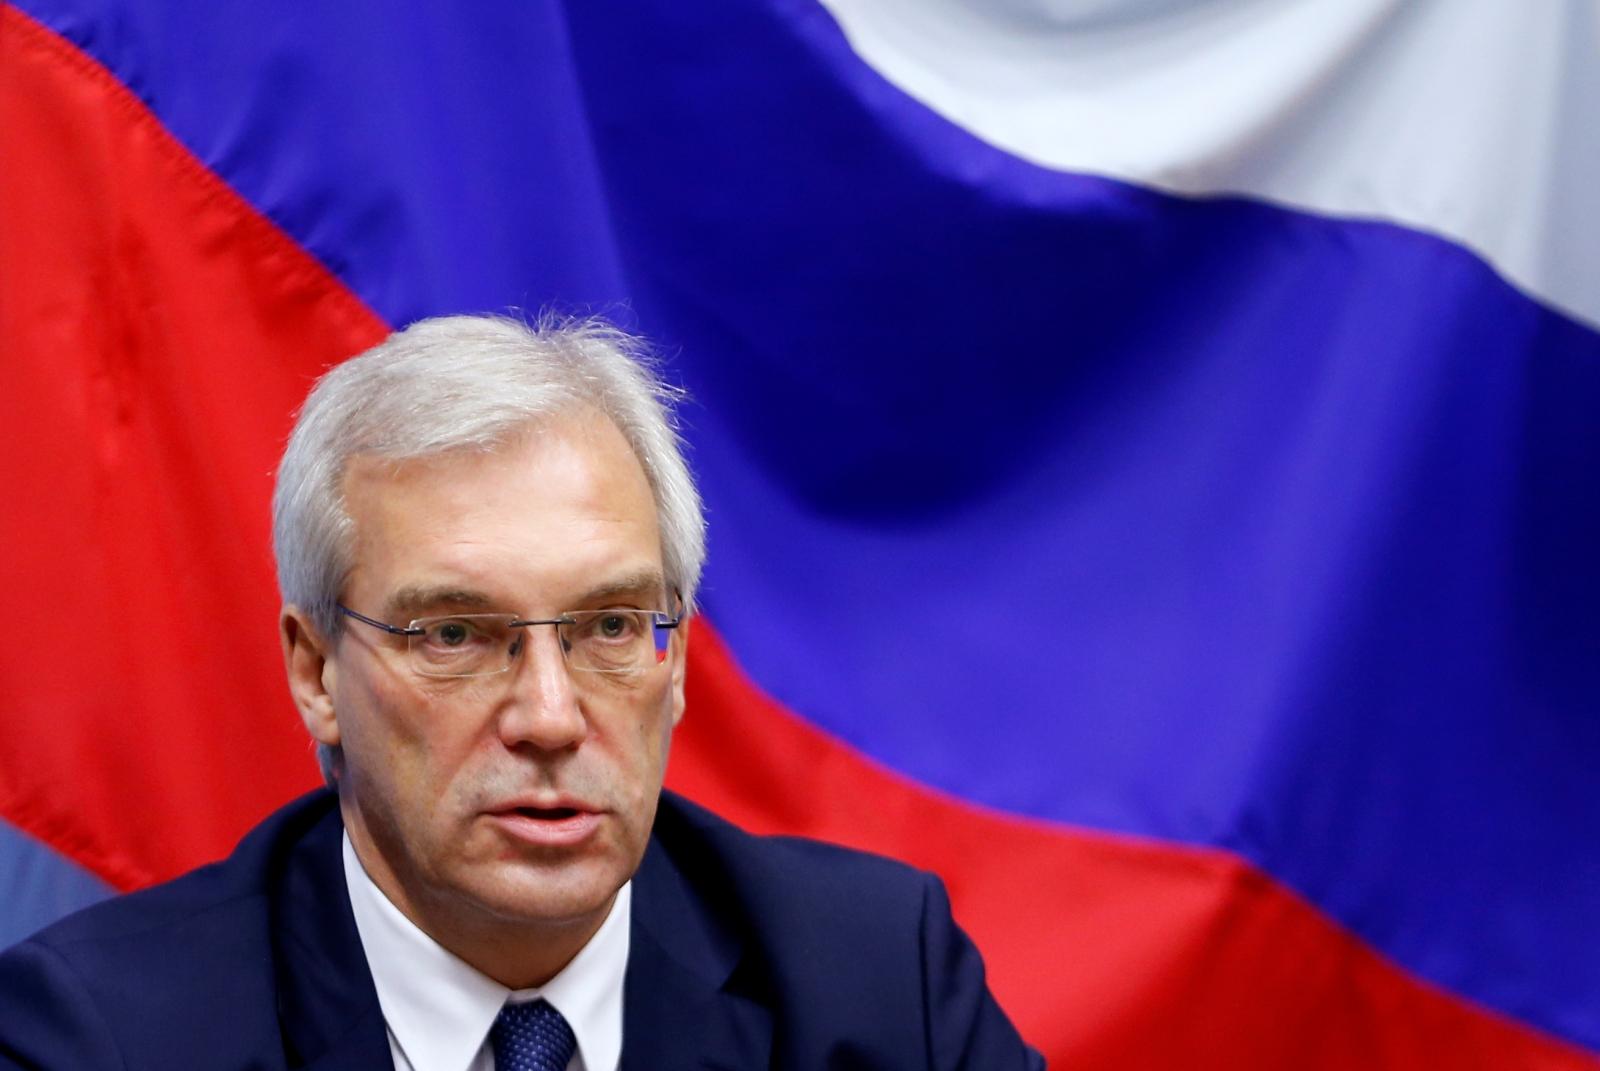 Russian ambassador Alexander Grushko